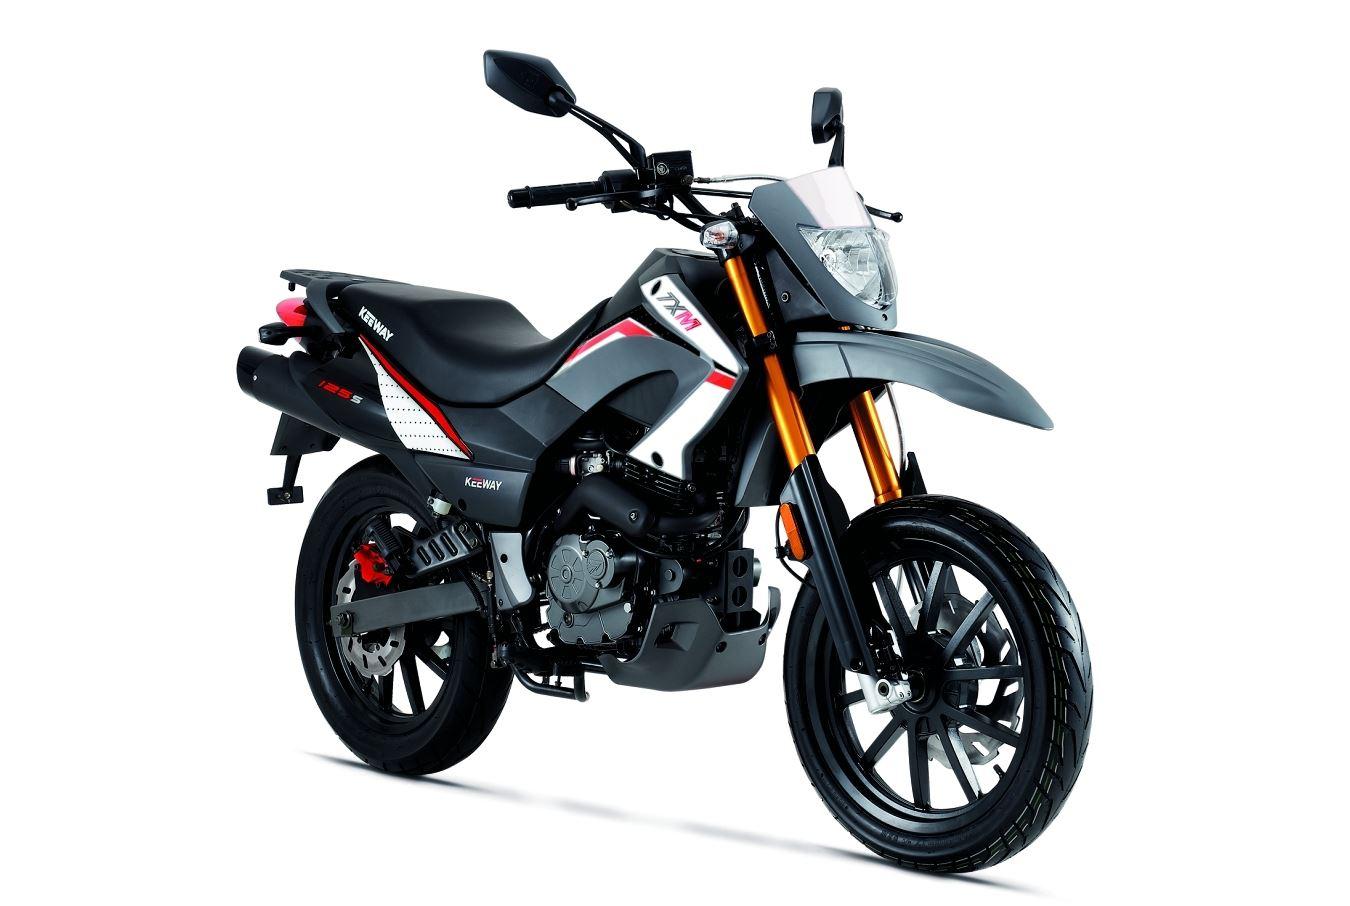 keeway tx supermoto 125 moto moto 125 andar de moto. Black Bedroom Furniture Sets. Home Design Ideas